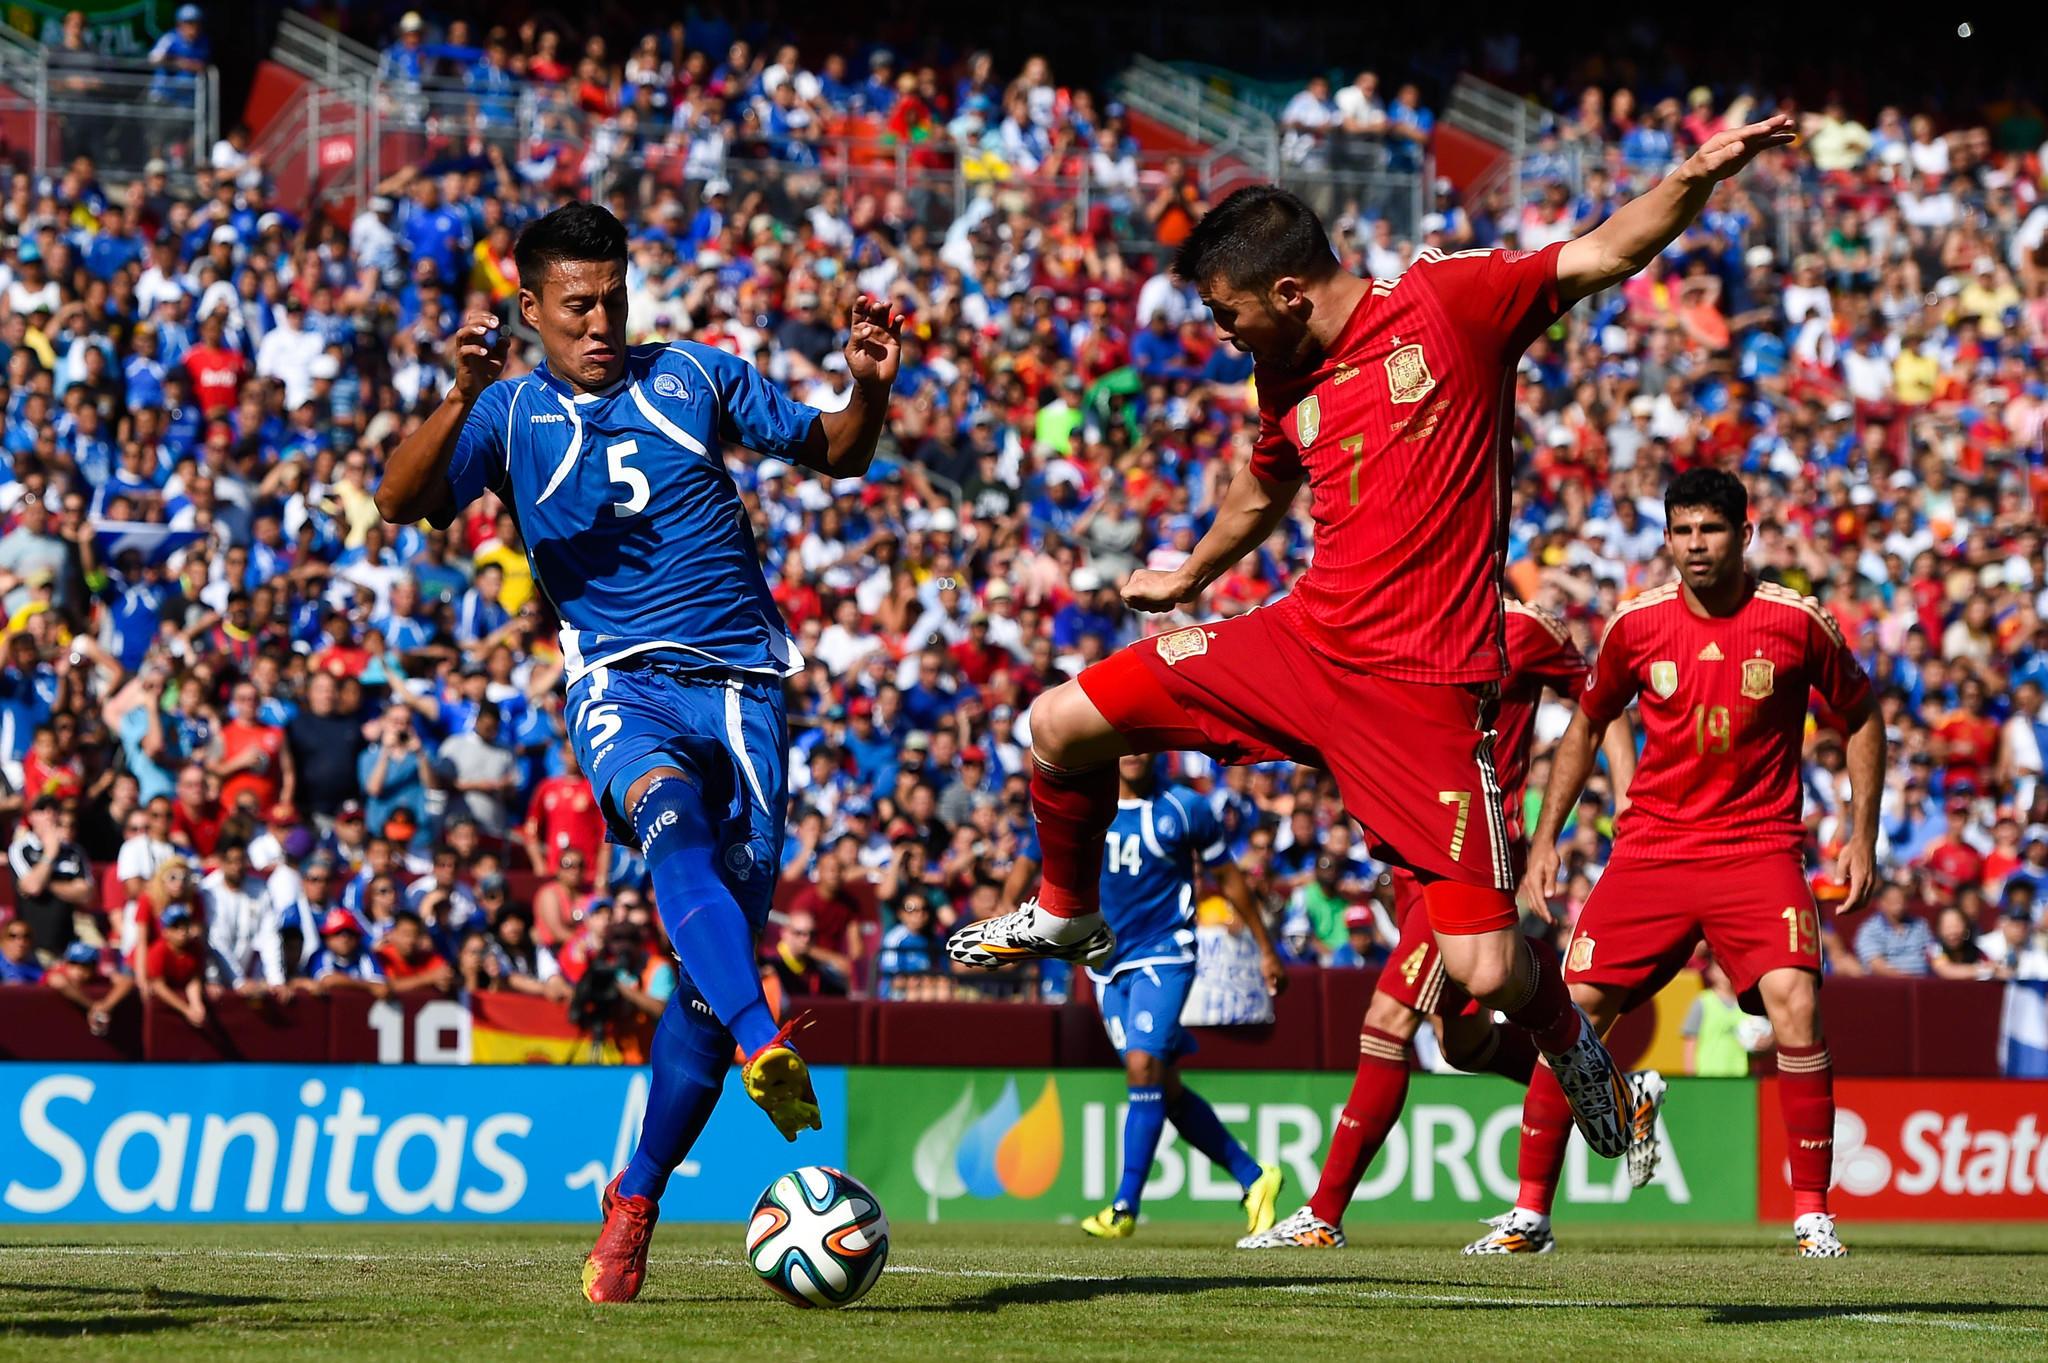 Spain's David Villa, who scored both goals Saturday, battles for the ball with Alexander Mendoza of El Salvador at FedEx Field.